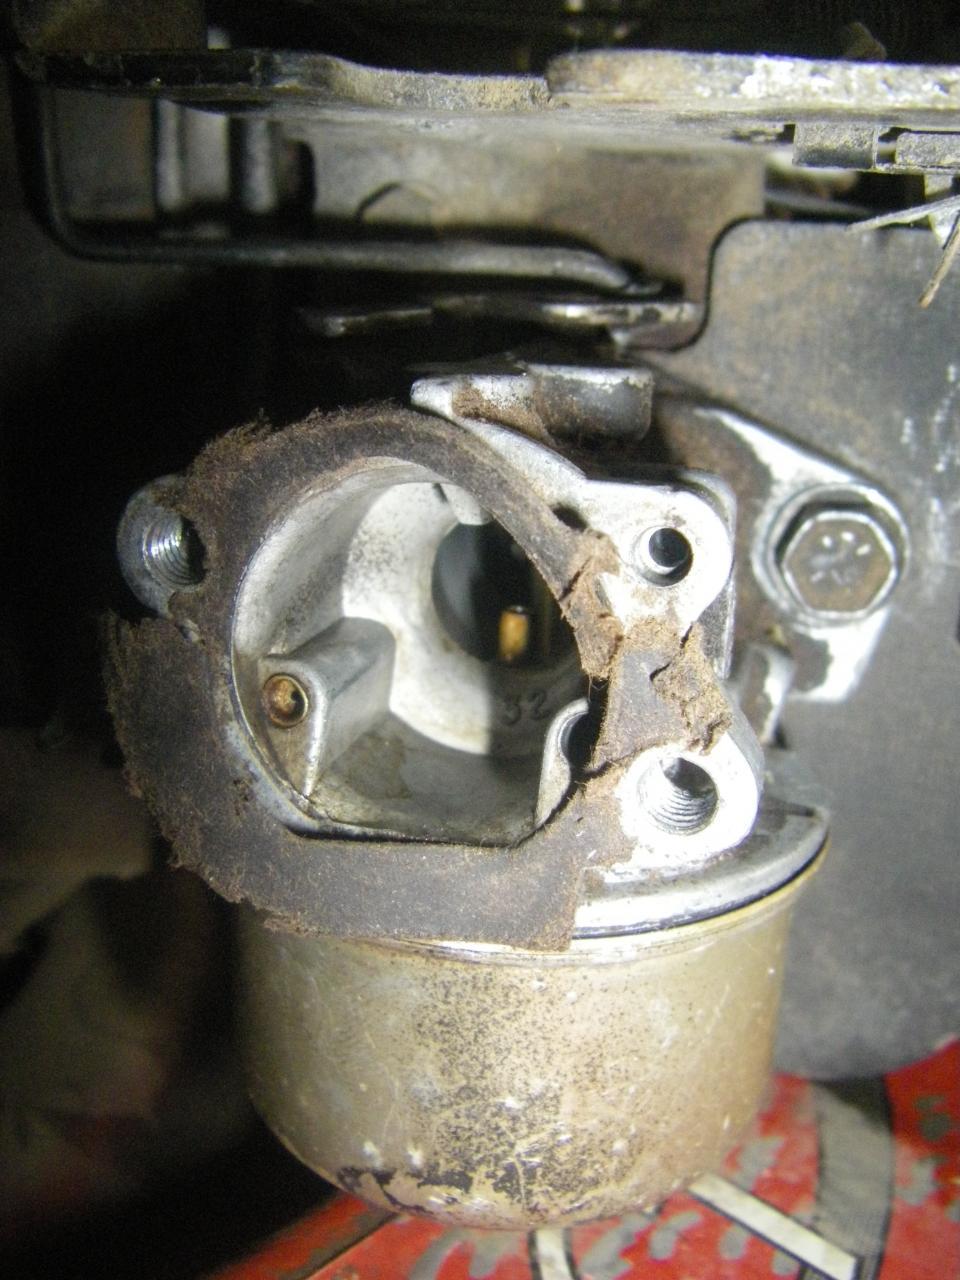 Intek 5 5HP backfires on (not) starting - OutdoorKing Repair